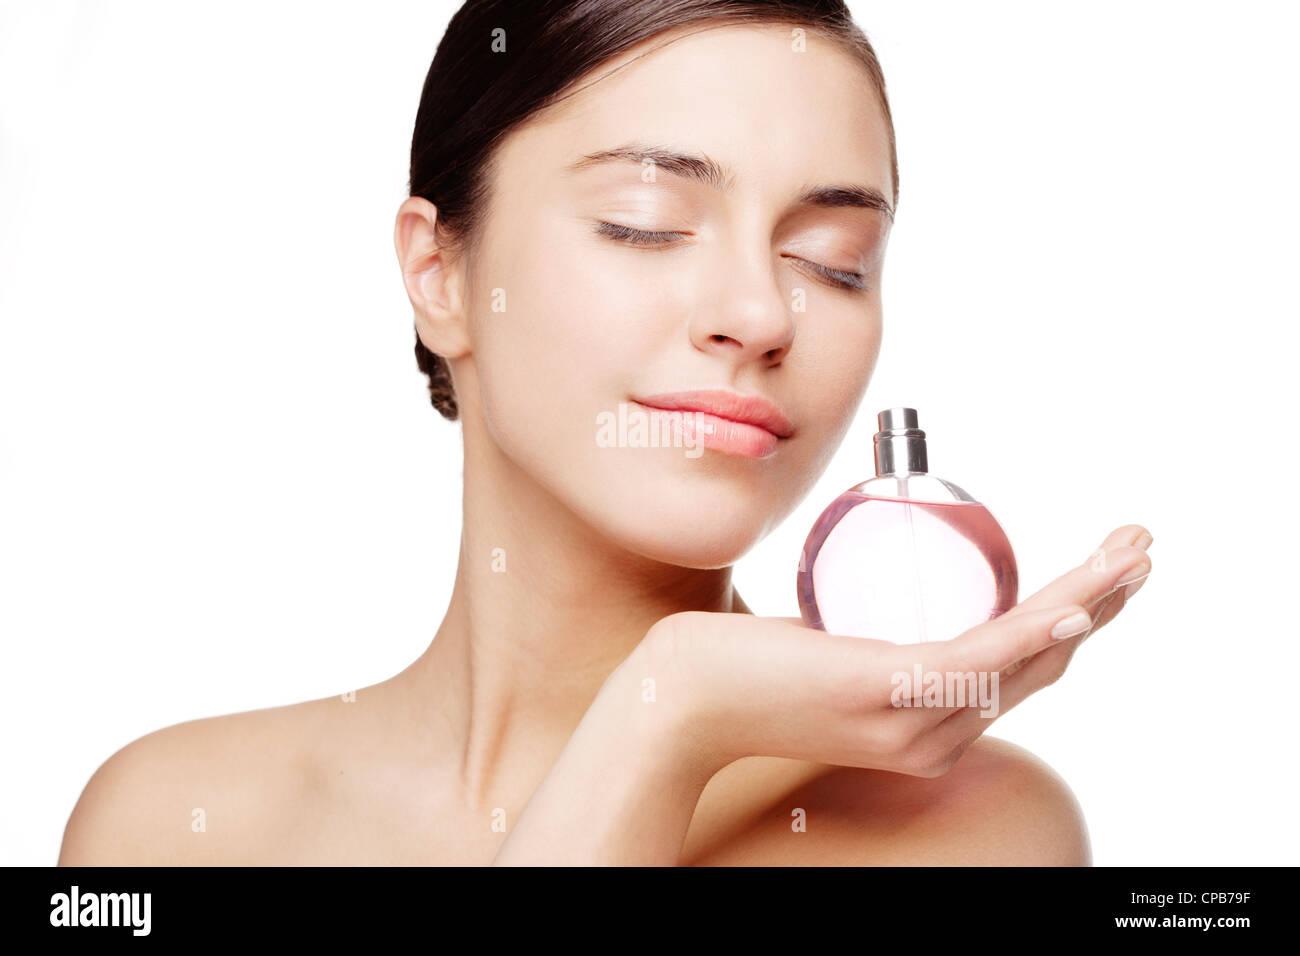 perfume - Stock Image